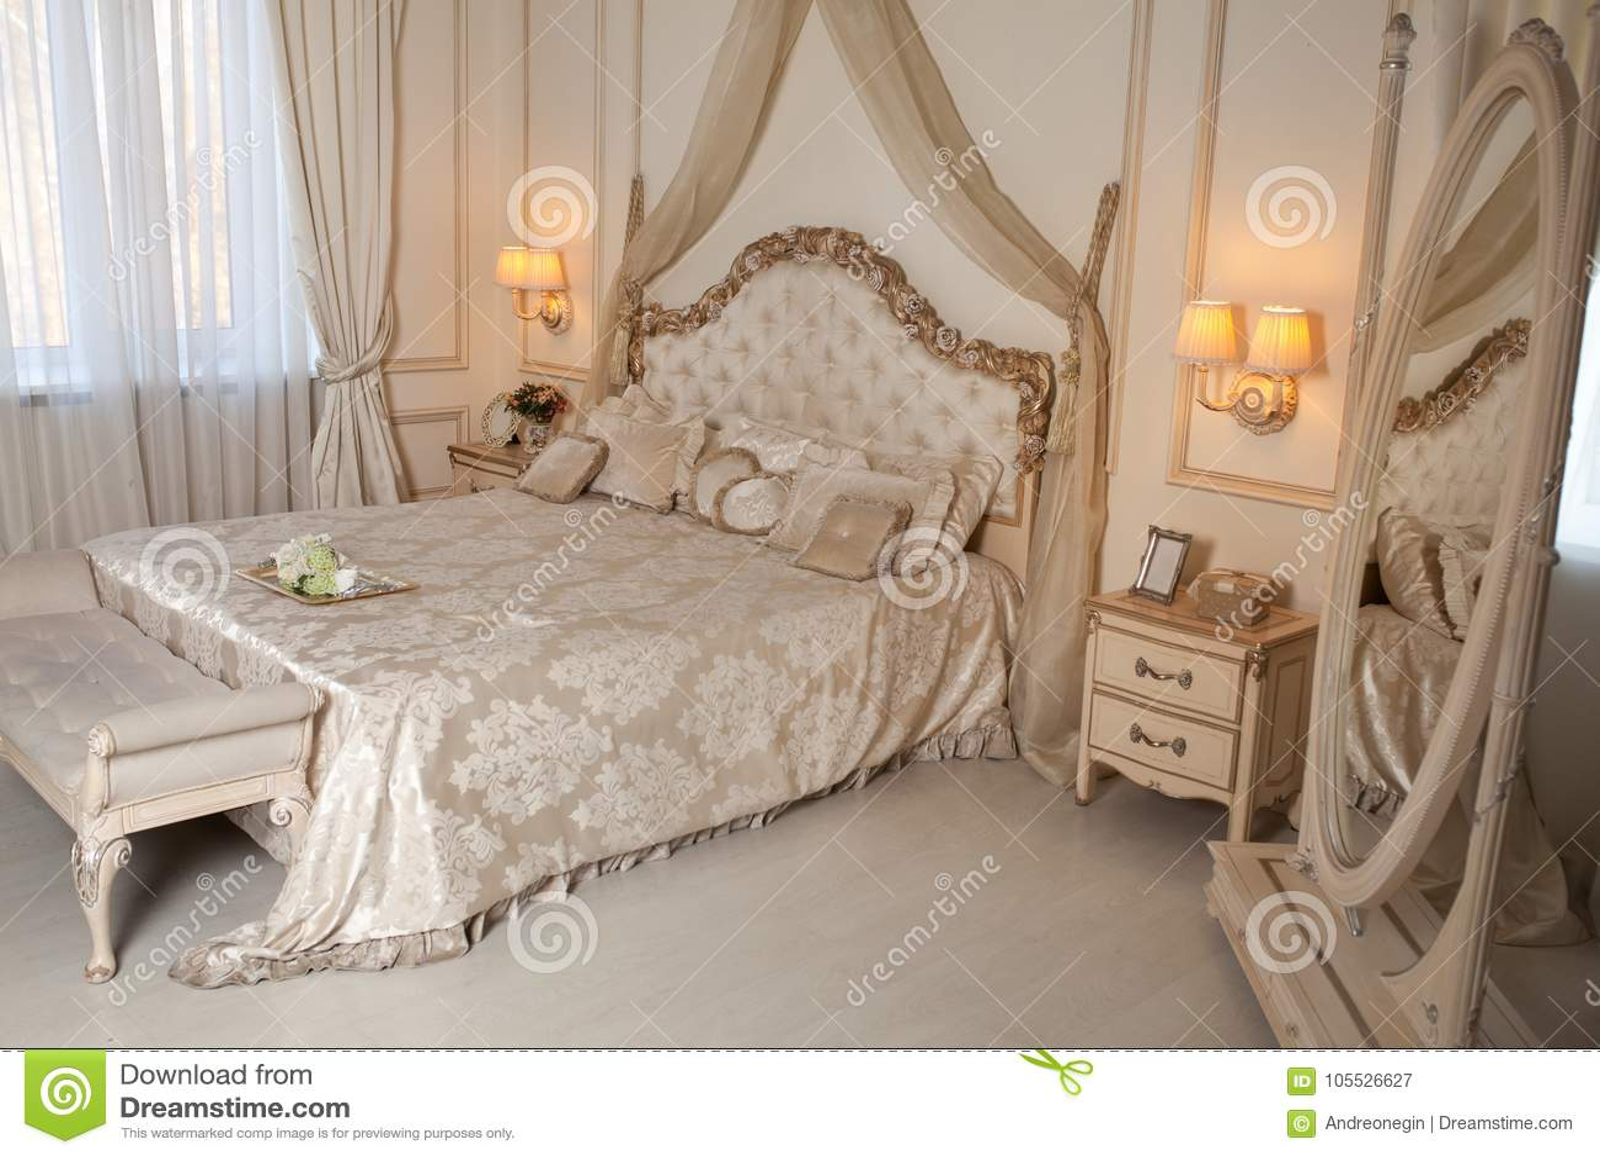 Stor bekväm dubbelsäng i elegant klassiskt sovrum